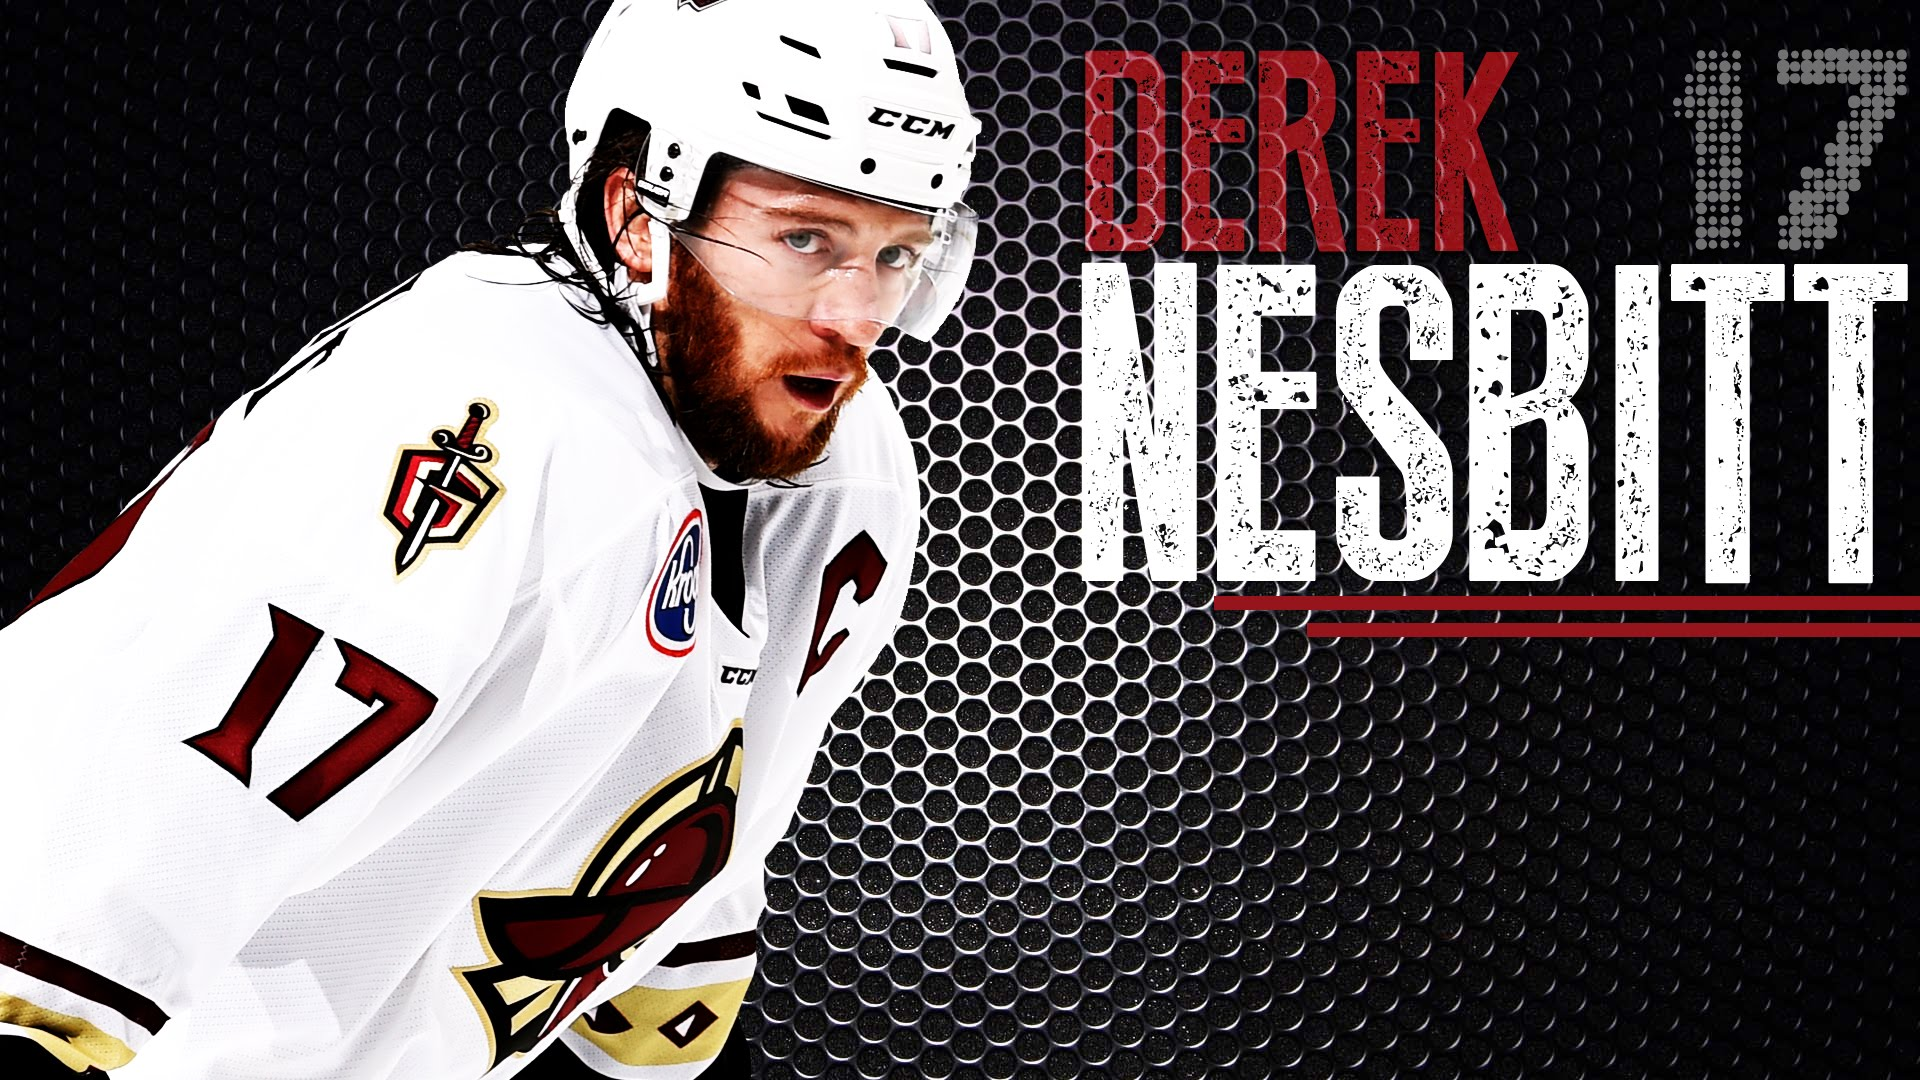 Atlanta Gladiators name Nesbitt home captain